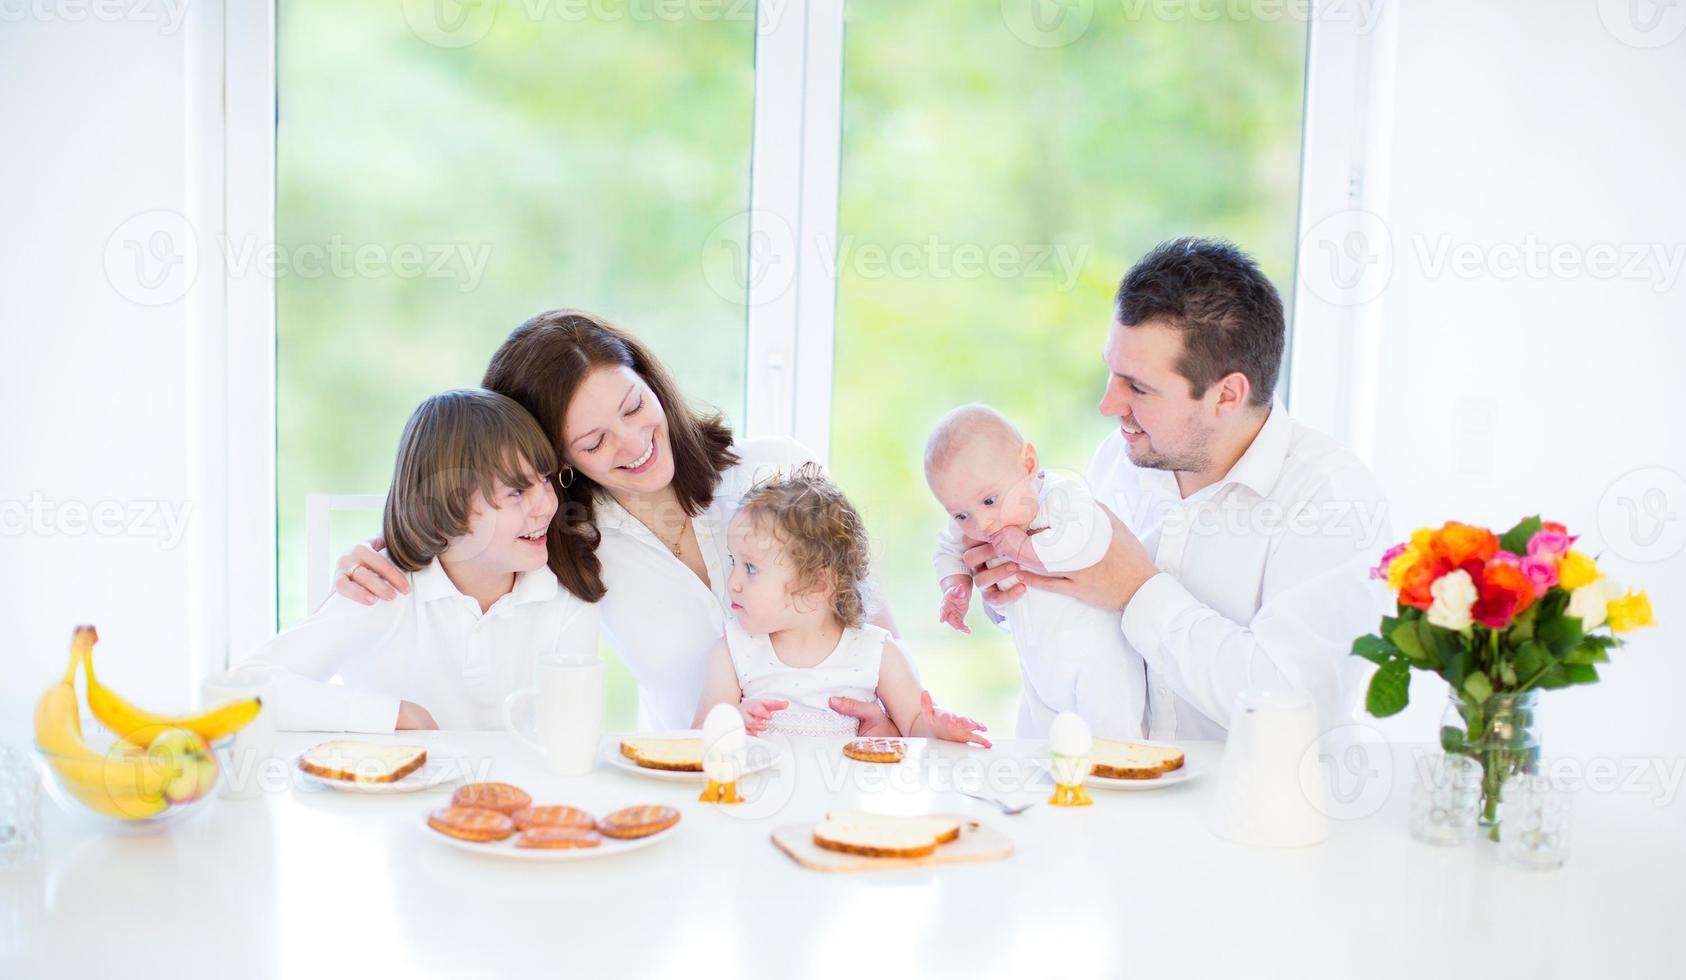 Young family with three children enjoying breakfast near big window photo